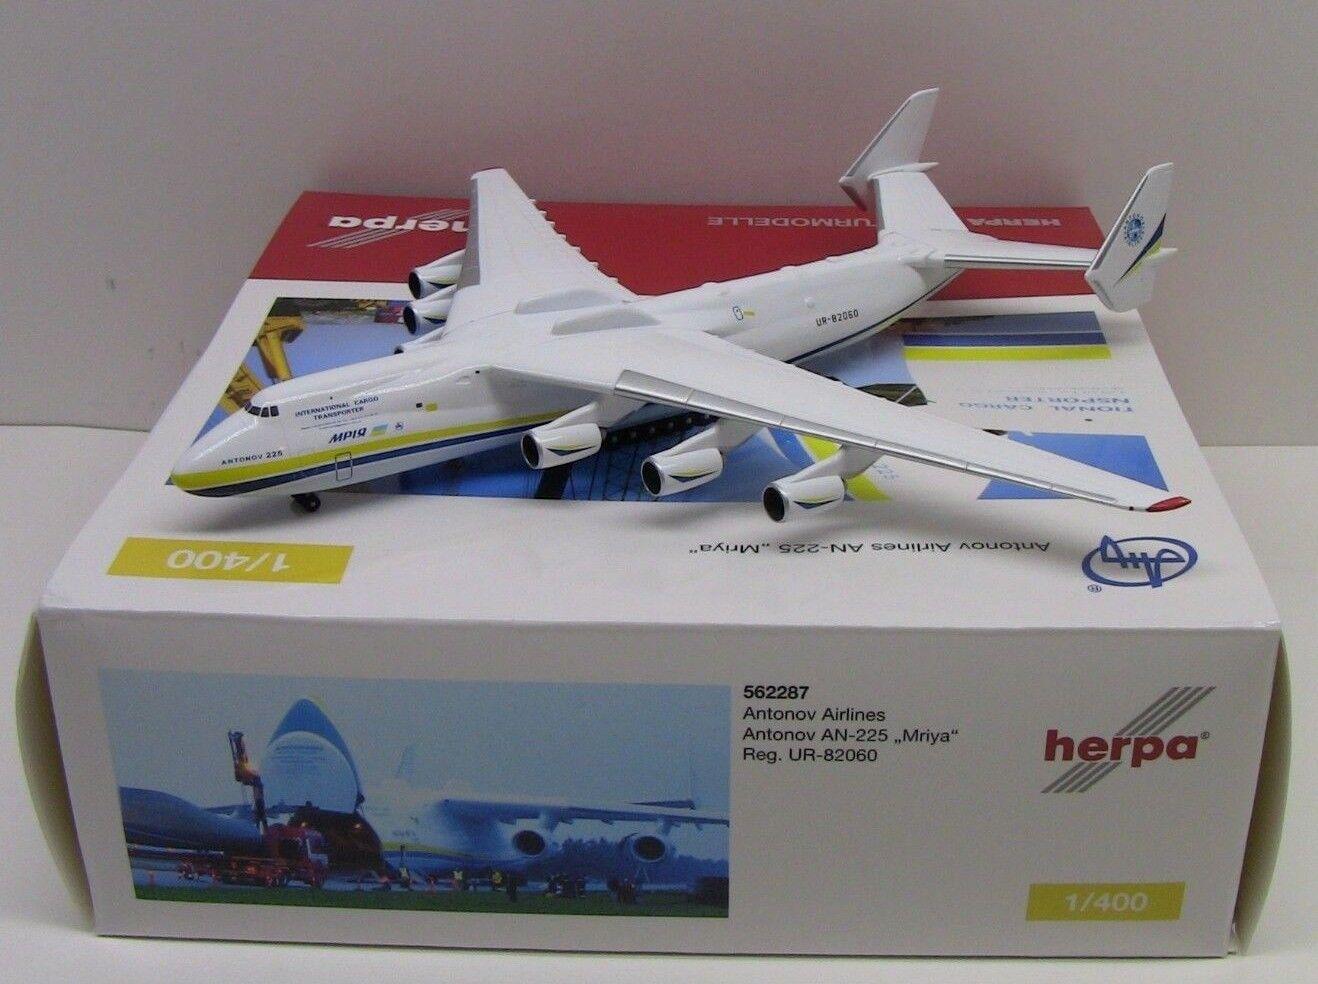 Herpa Wings Antonov AN-225 Mriya blu giallo giallo giallo 1 400 HE562287 6079f6